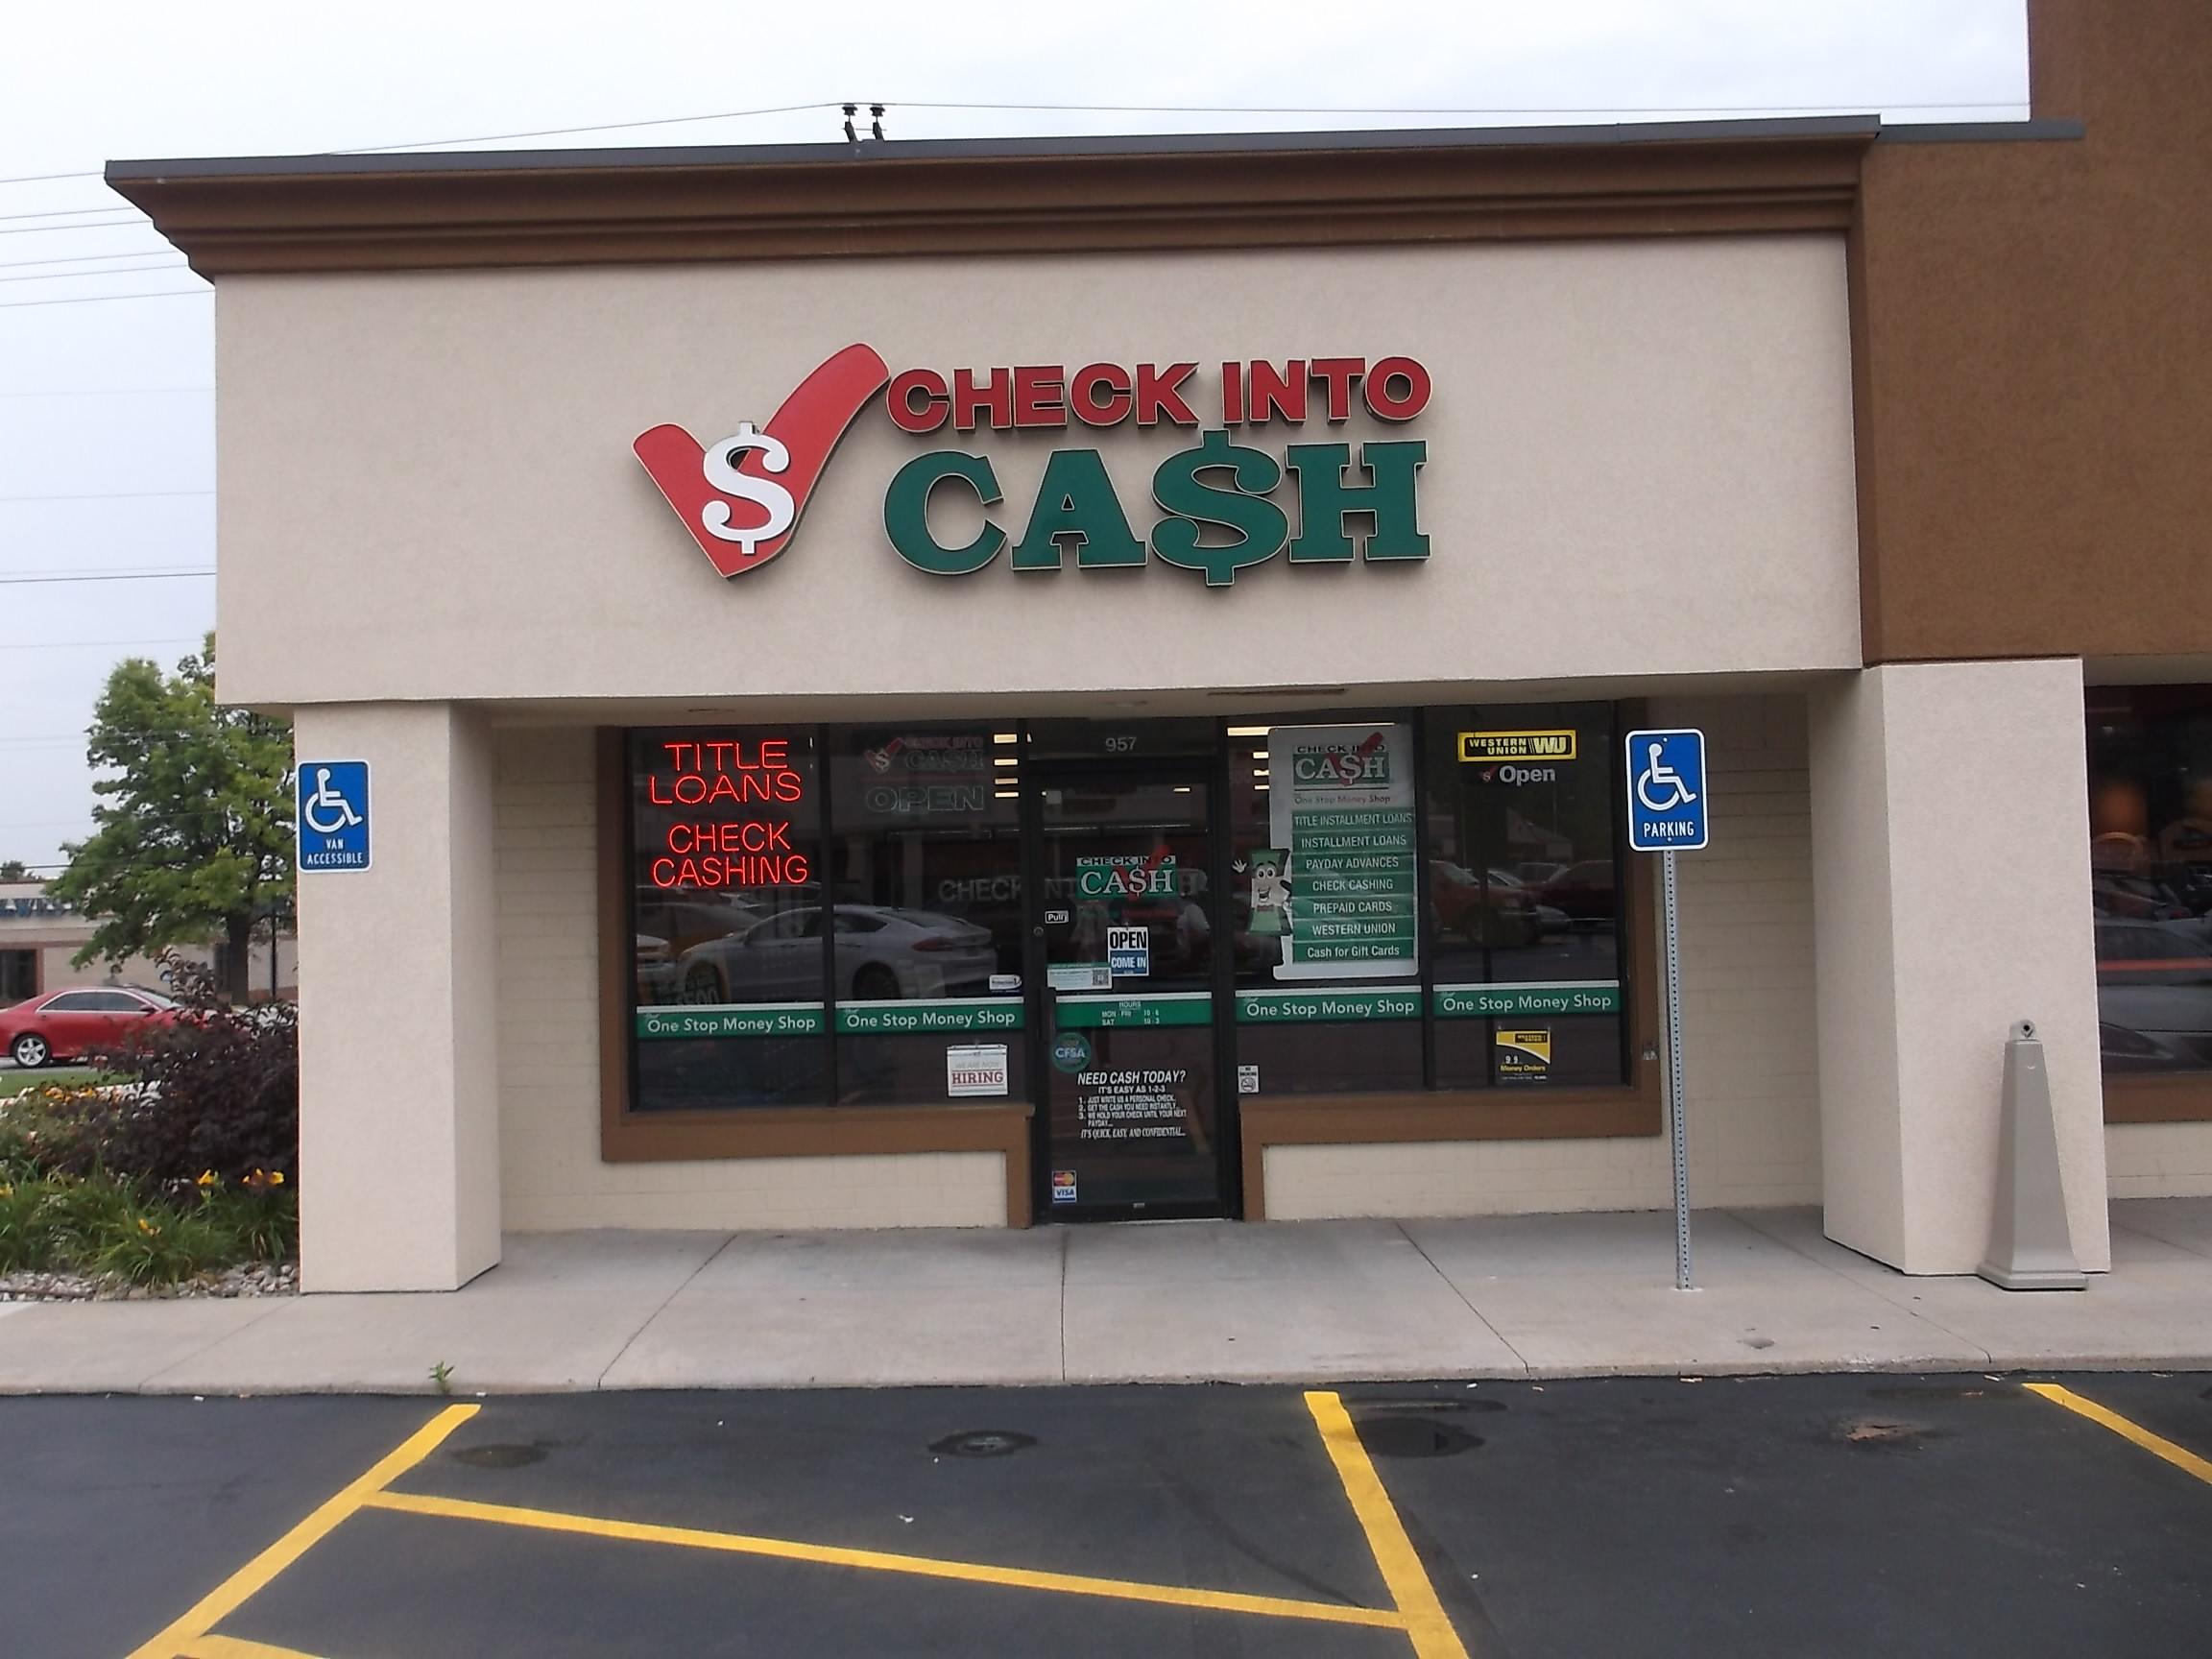 Advanced financial cash advance image 10